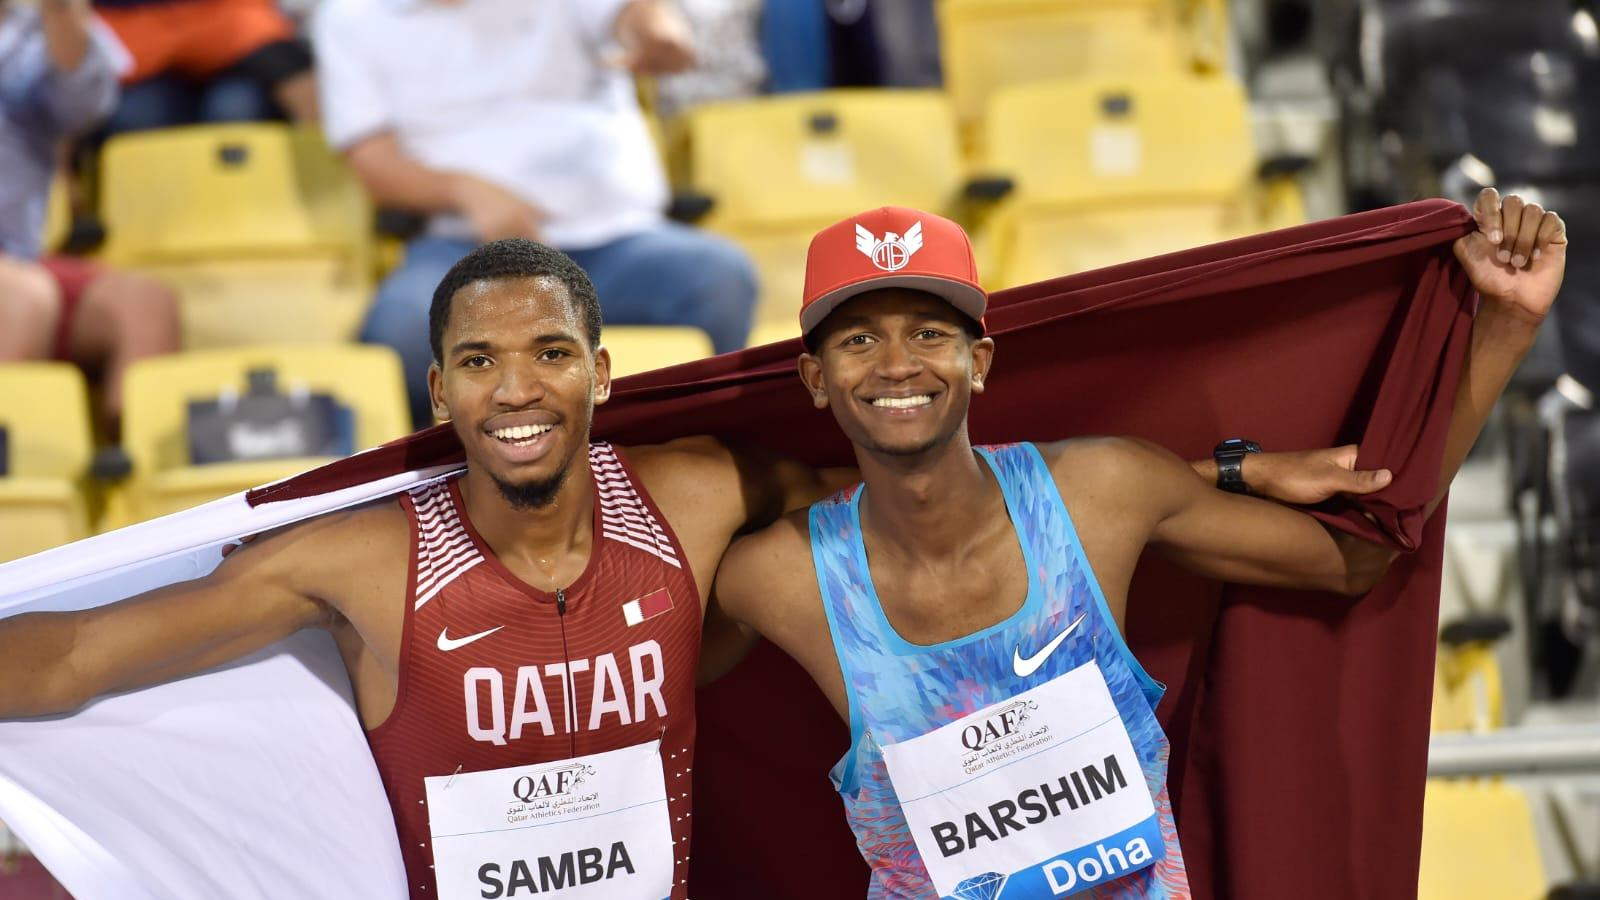 Qatari stars Barshim and Samba to kick off their Wanda Diamond League season in Doha